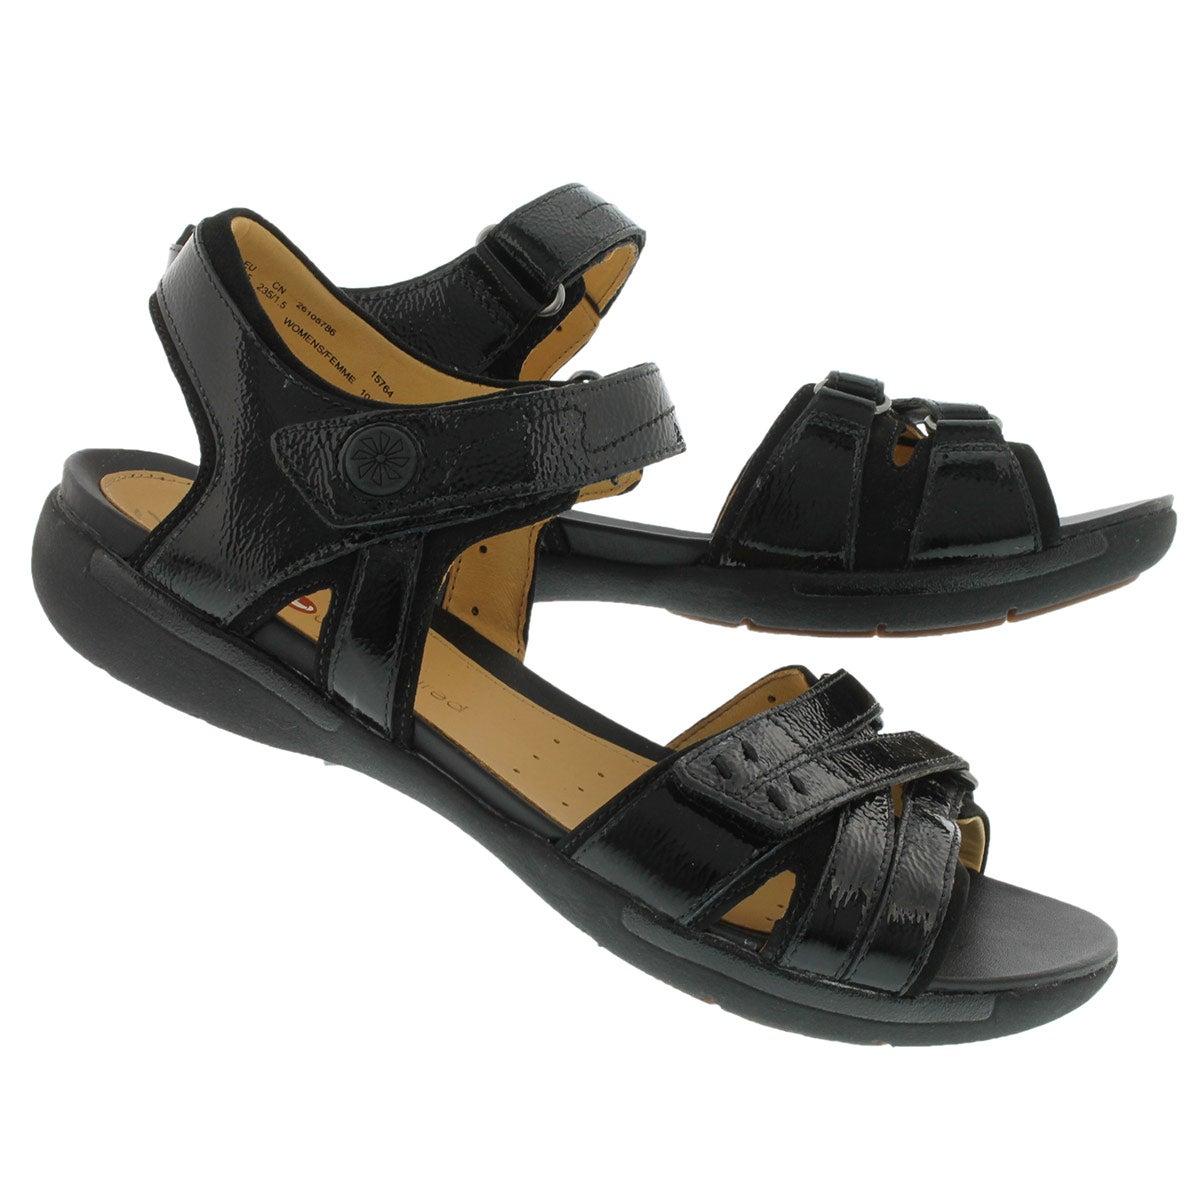 Sandale UN.VASHA, noir verni, fem